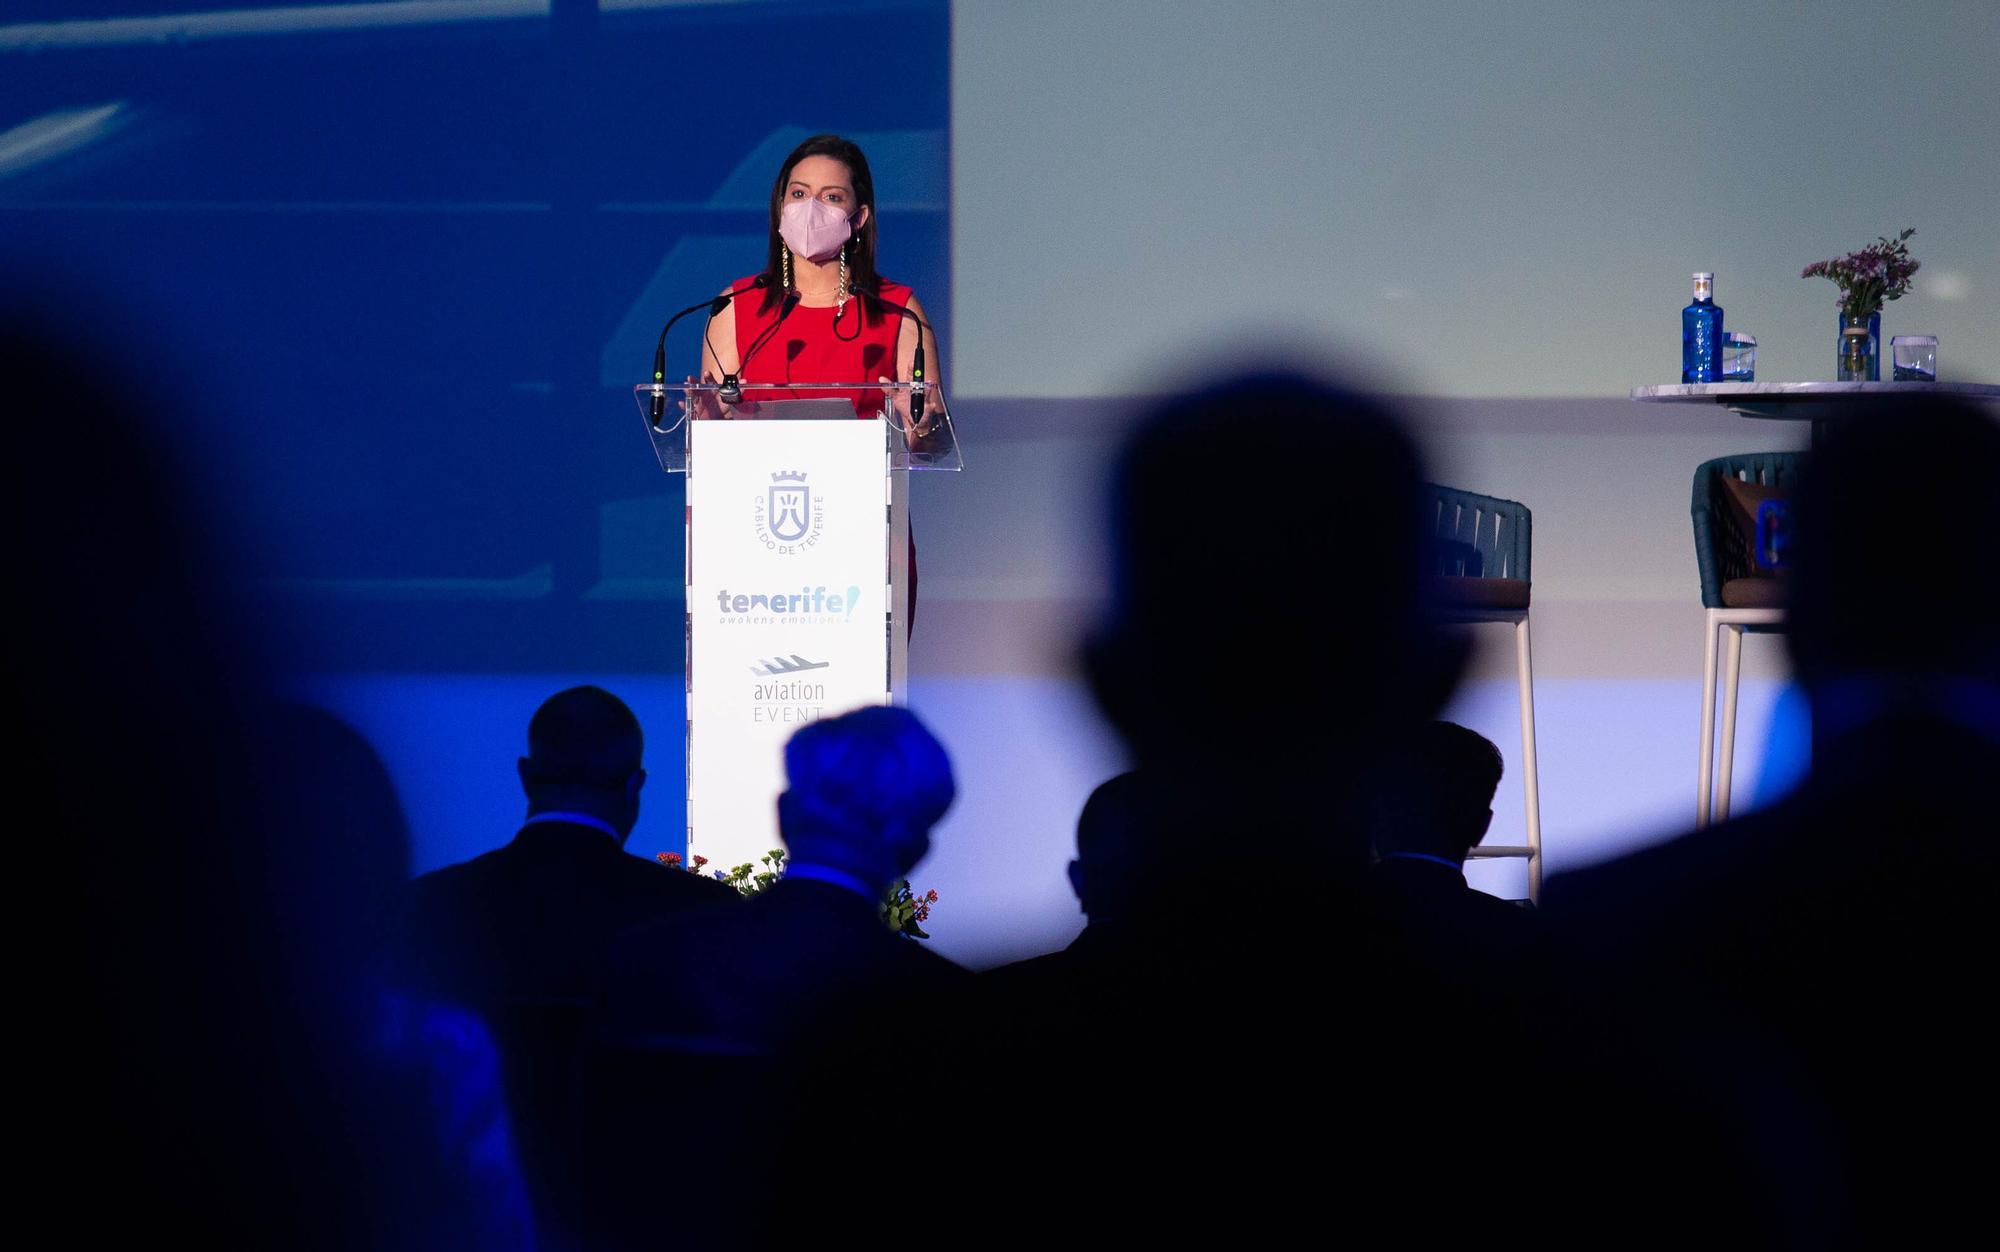 Aviation-Event Tenerife 2021